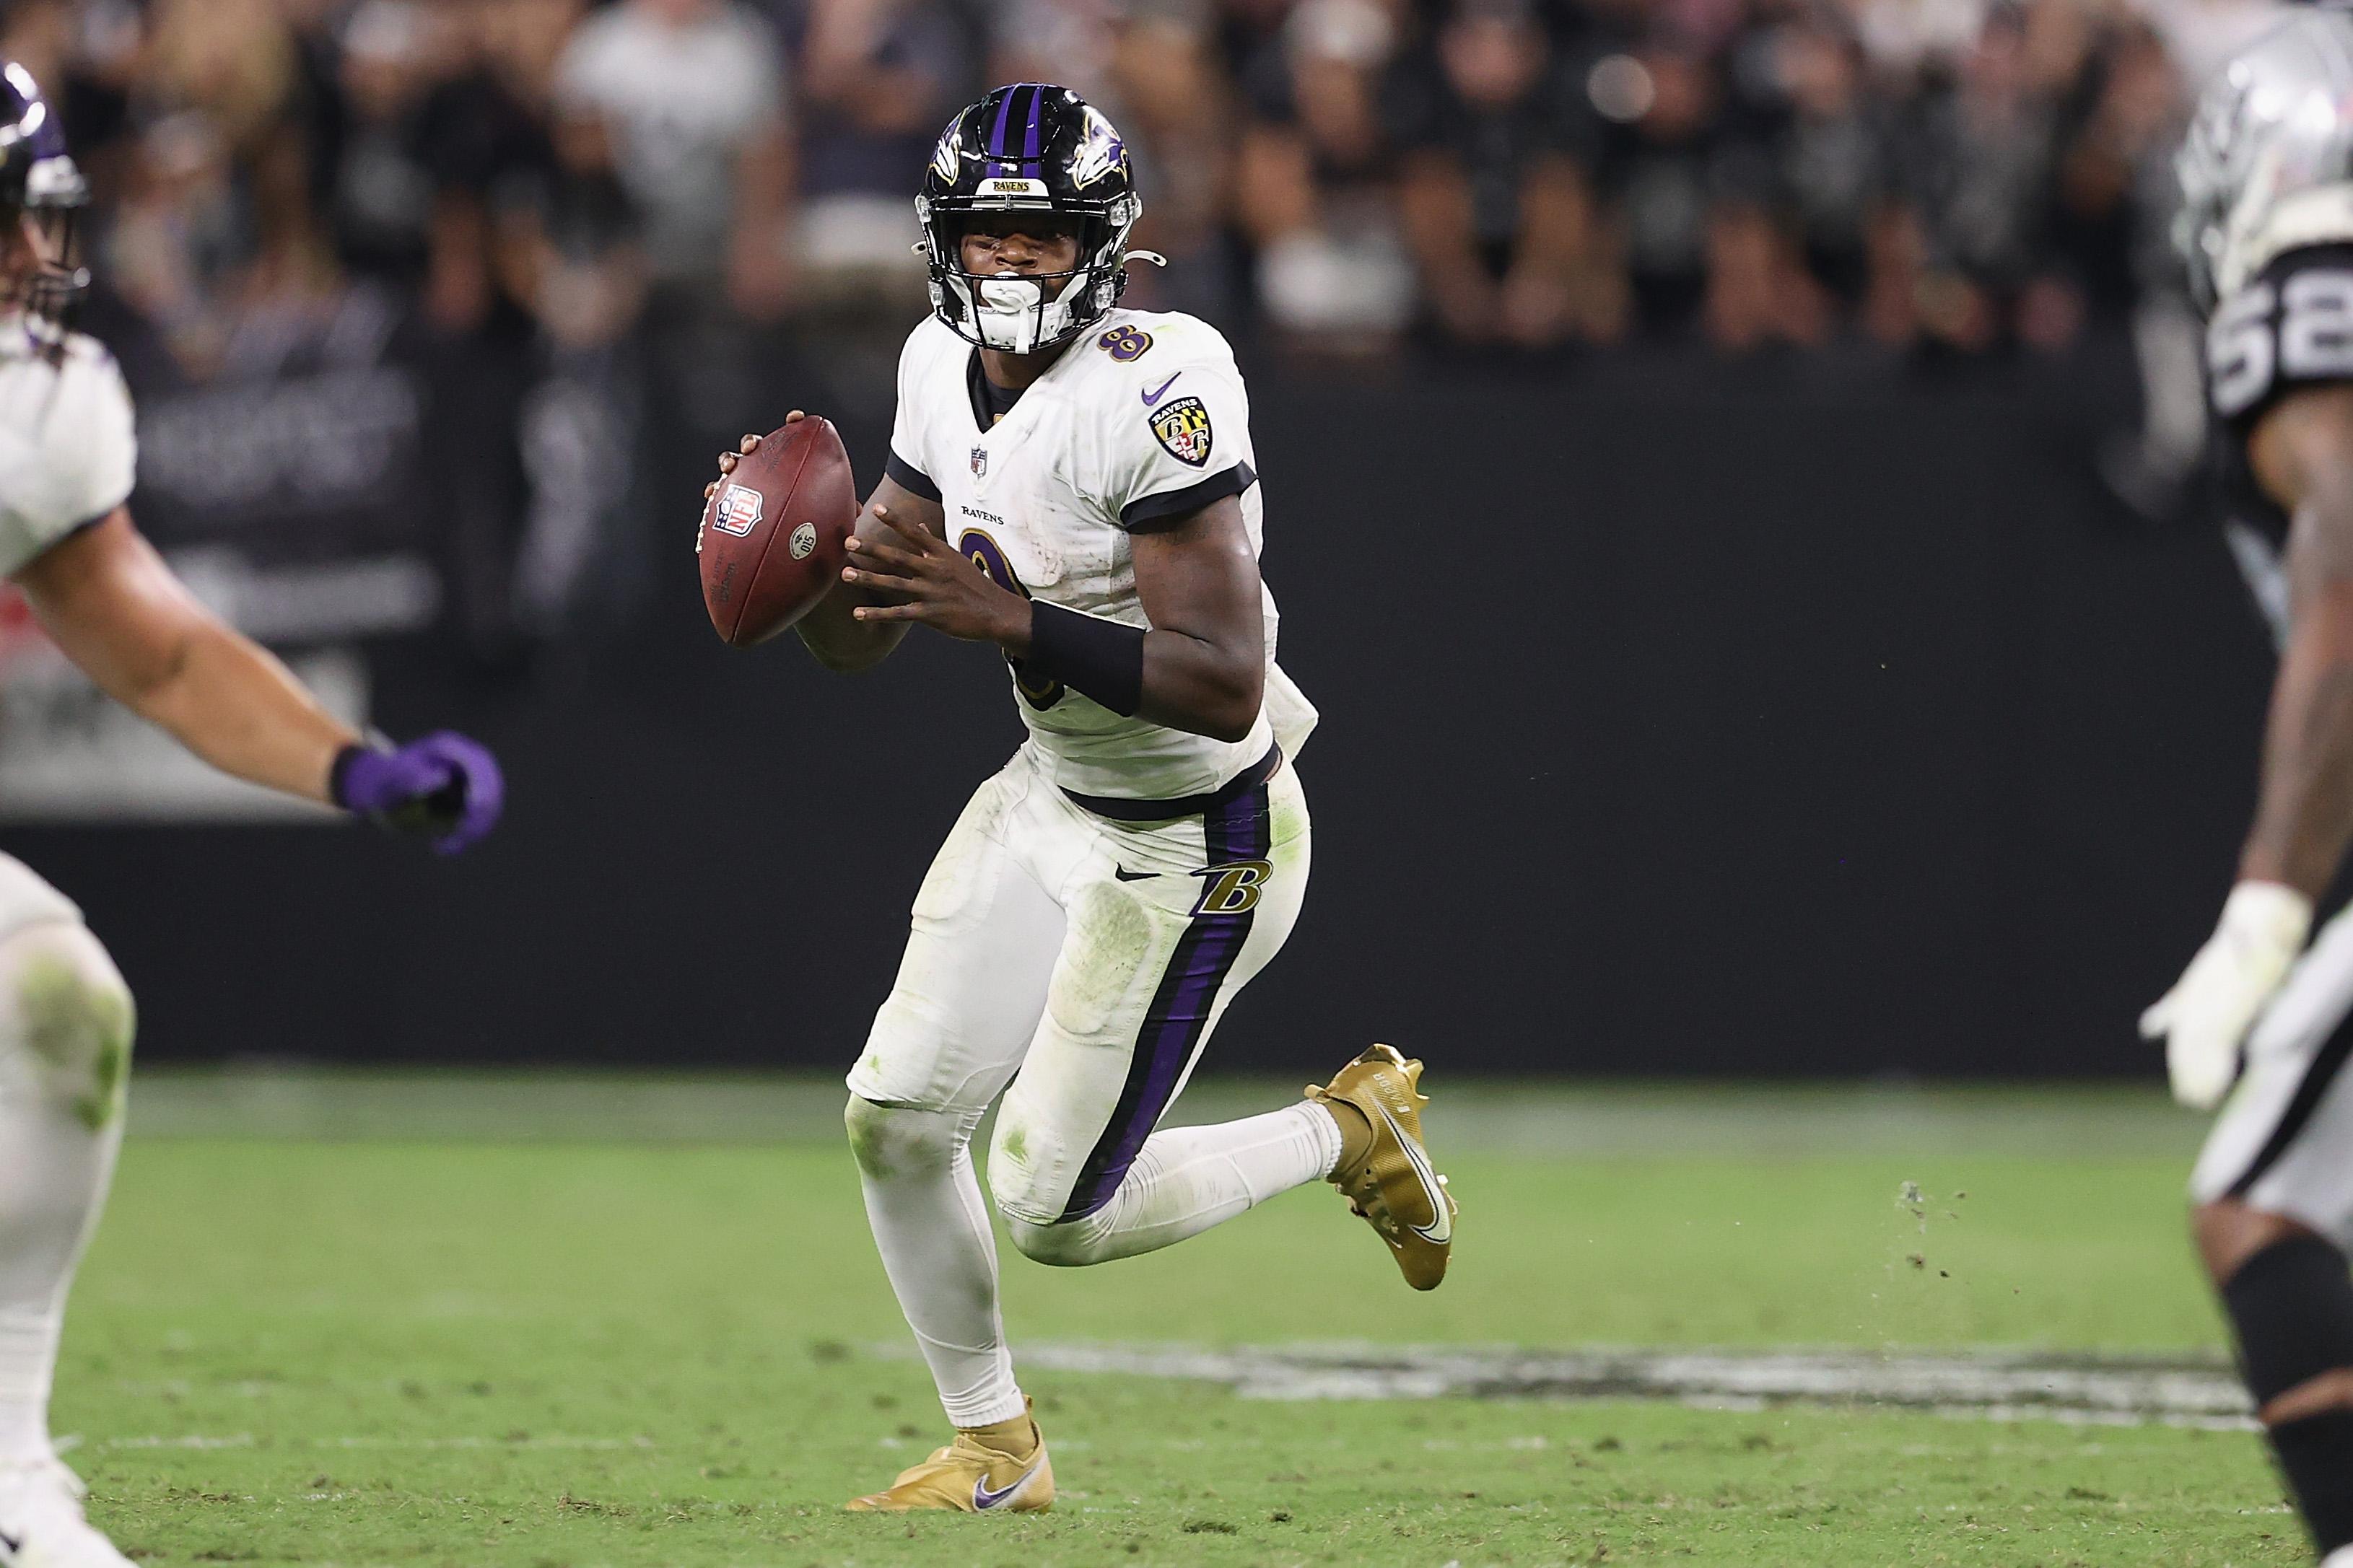 Quarterback Lamar Jackson #8 of the Baltimore Ravens looks to pass during the NFL game against the Las Vegas Raiders at Allegiant Stadium on September 13, 2021 in Las Vegas, Nevada.